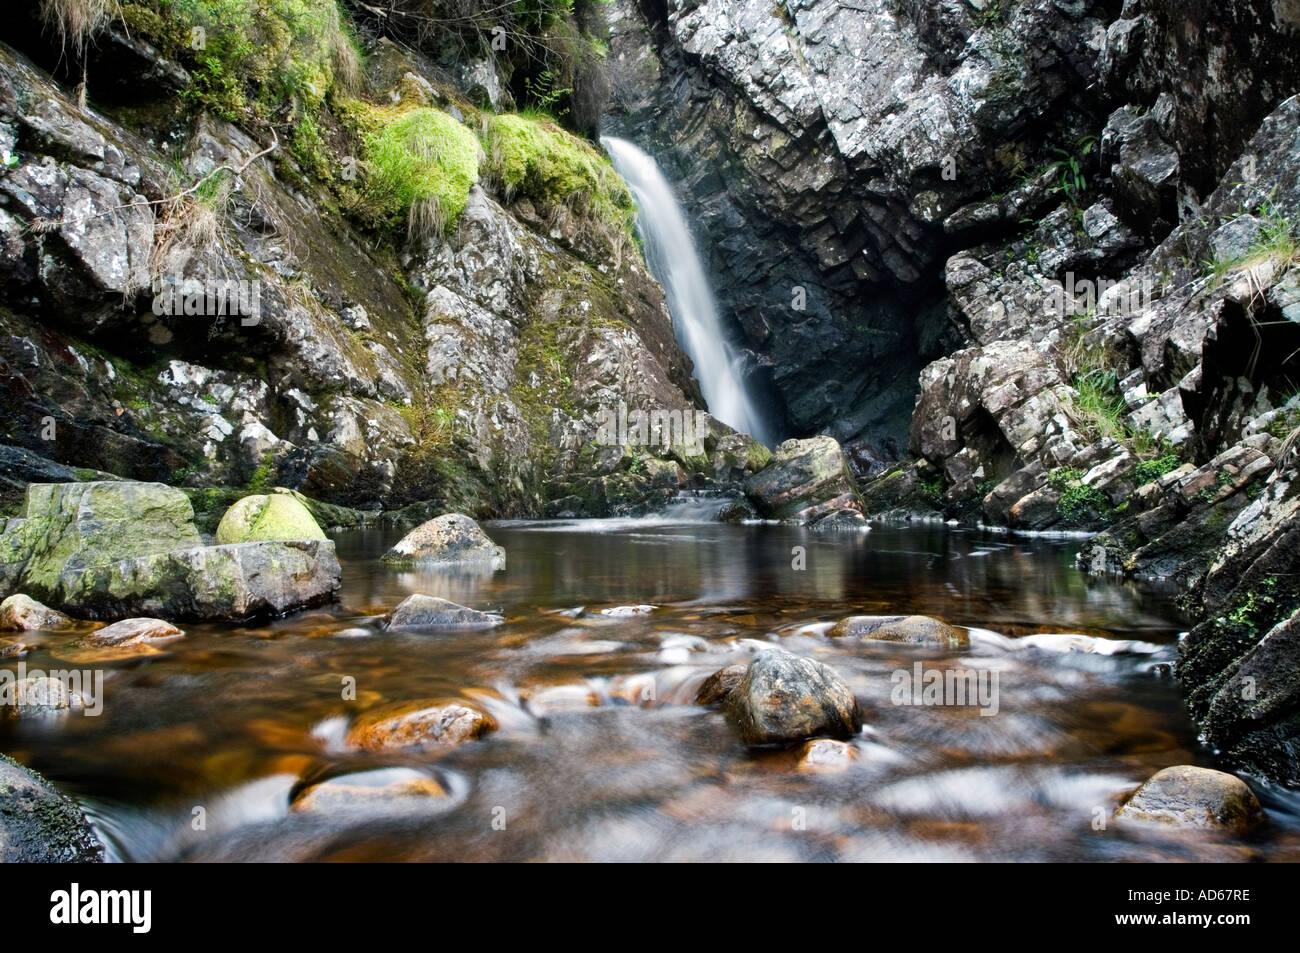 Scottish Waterfall And Pool Strathconon Highlands Scotland Stock Photo Royalty Free Image